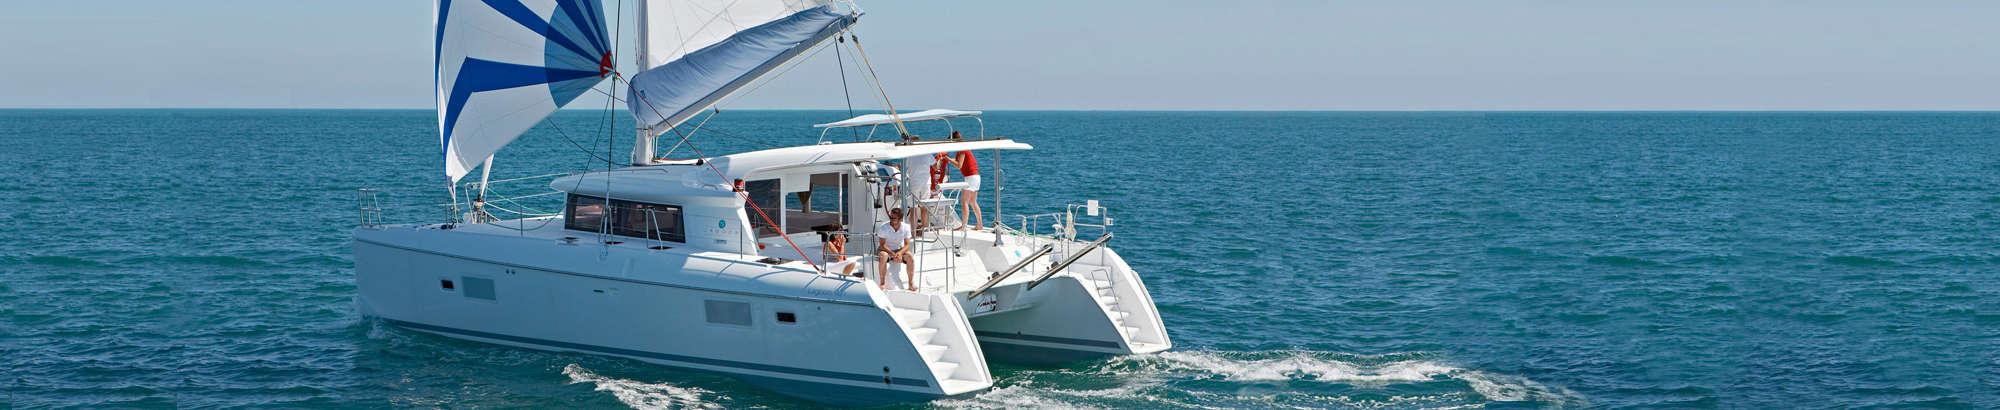 onway location croisi re en voilier et catamaran. Black Bedroom Furniture Sets. Home Design Ideas